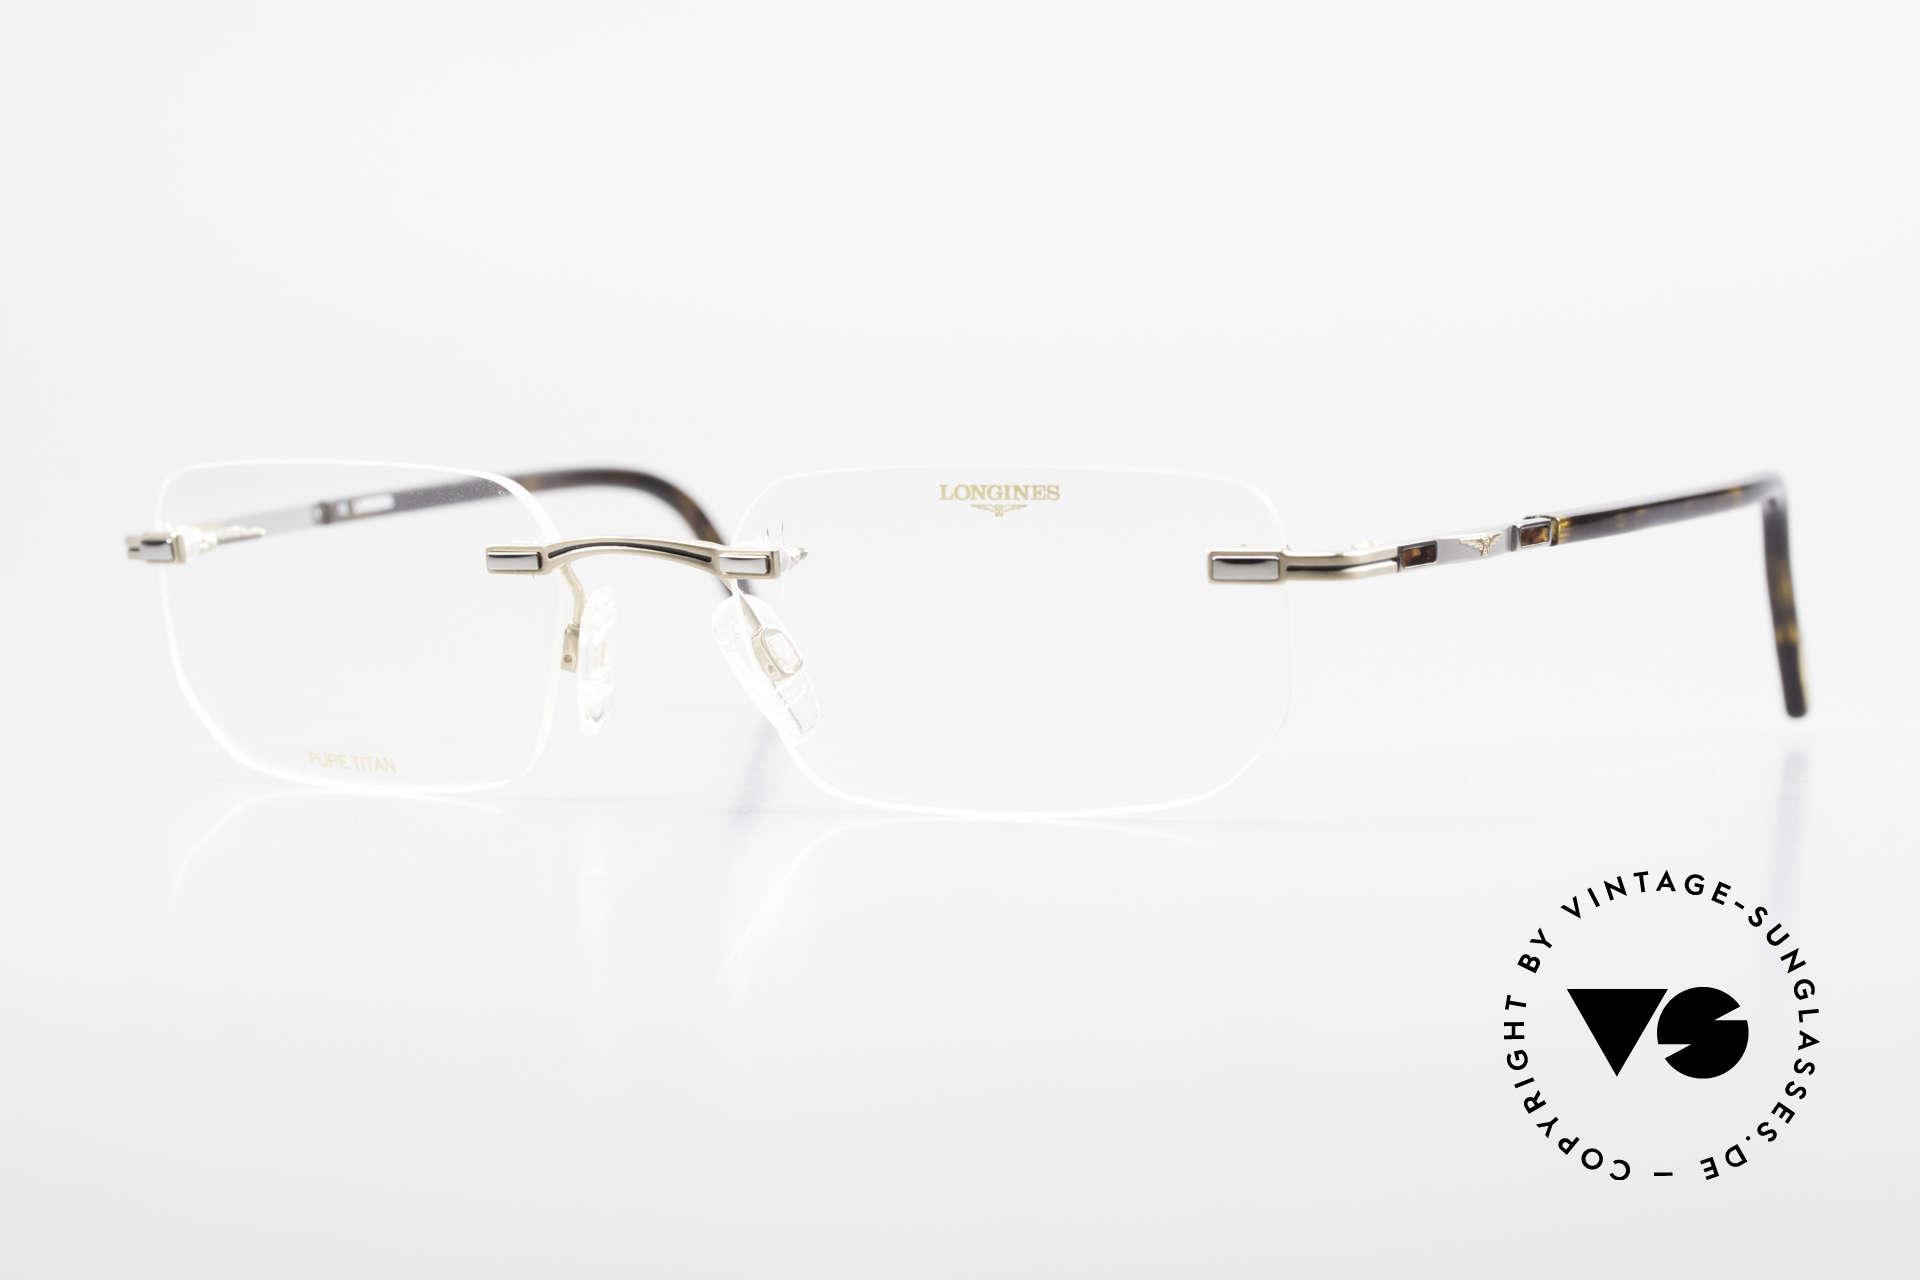 Longines 4238 90's Rimless Glasses Pure Titan, rimless 1990's eyeglases; Pure Titan men's glasses, Made for Men